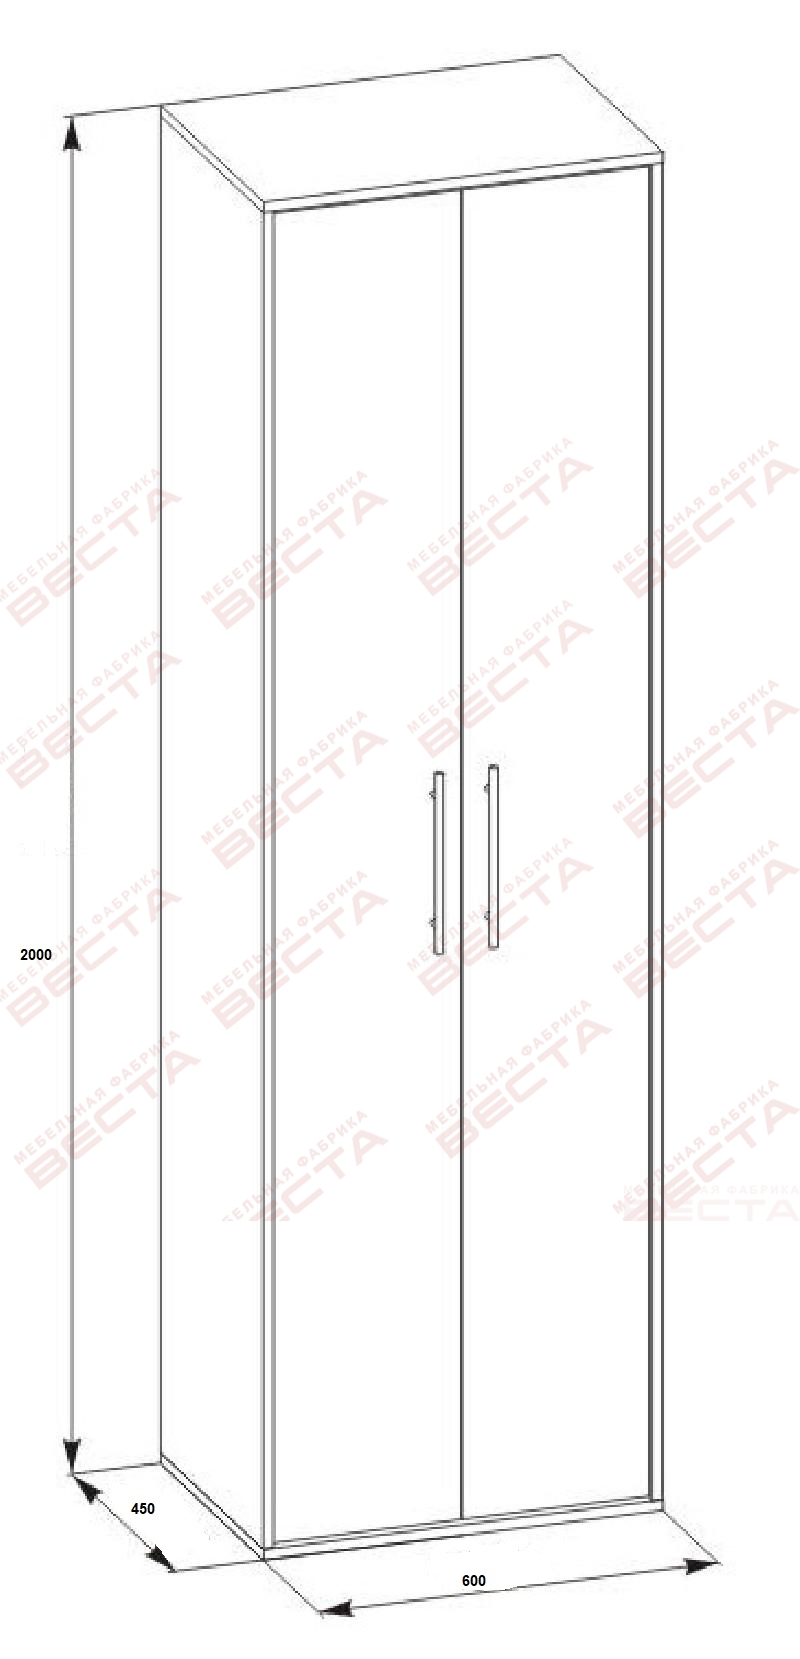 Шкаф для одежды ш 600мм МДФ (уш)